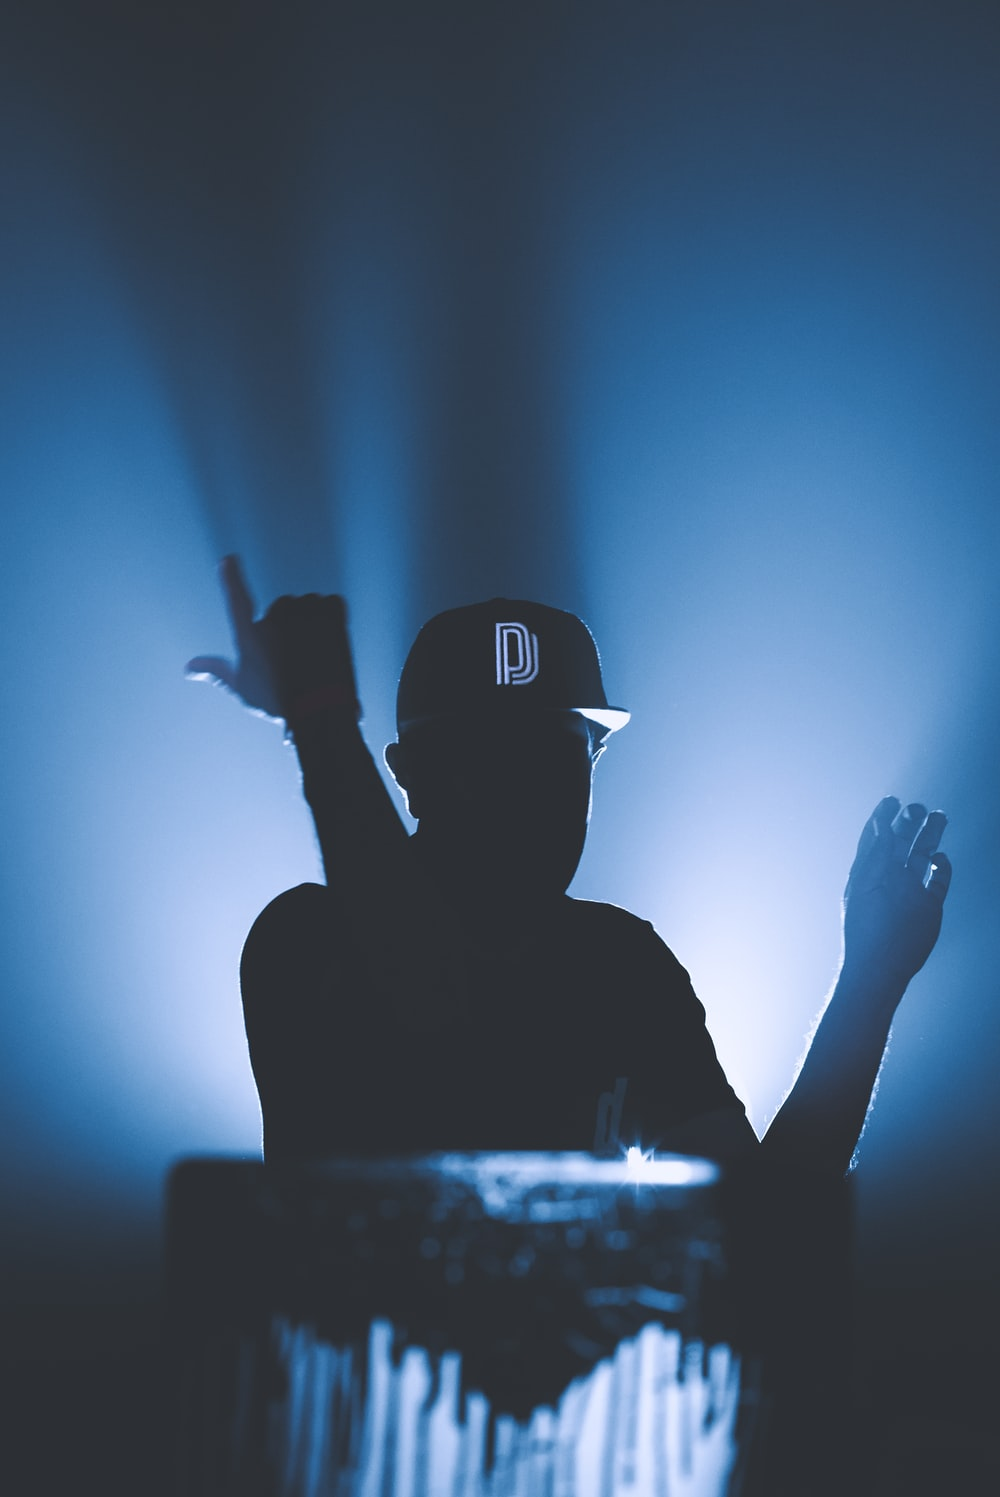 silhouette of man wearing black cap